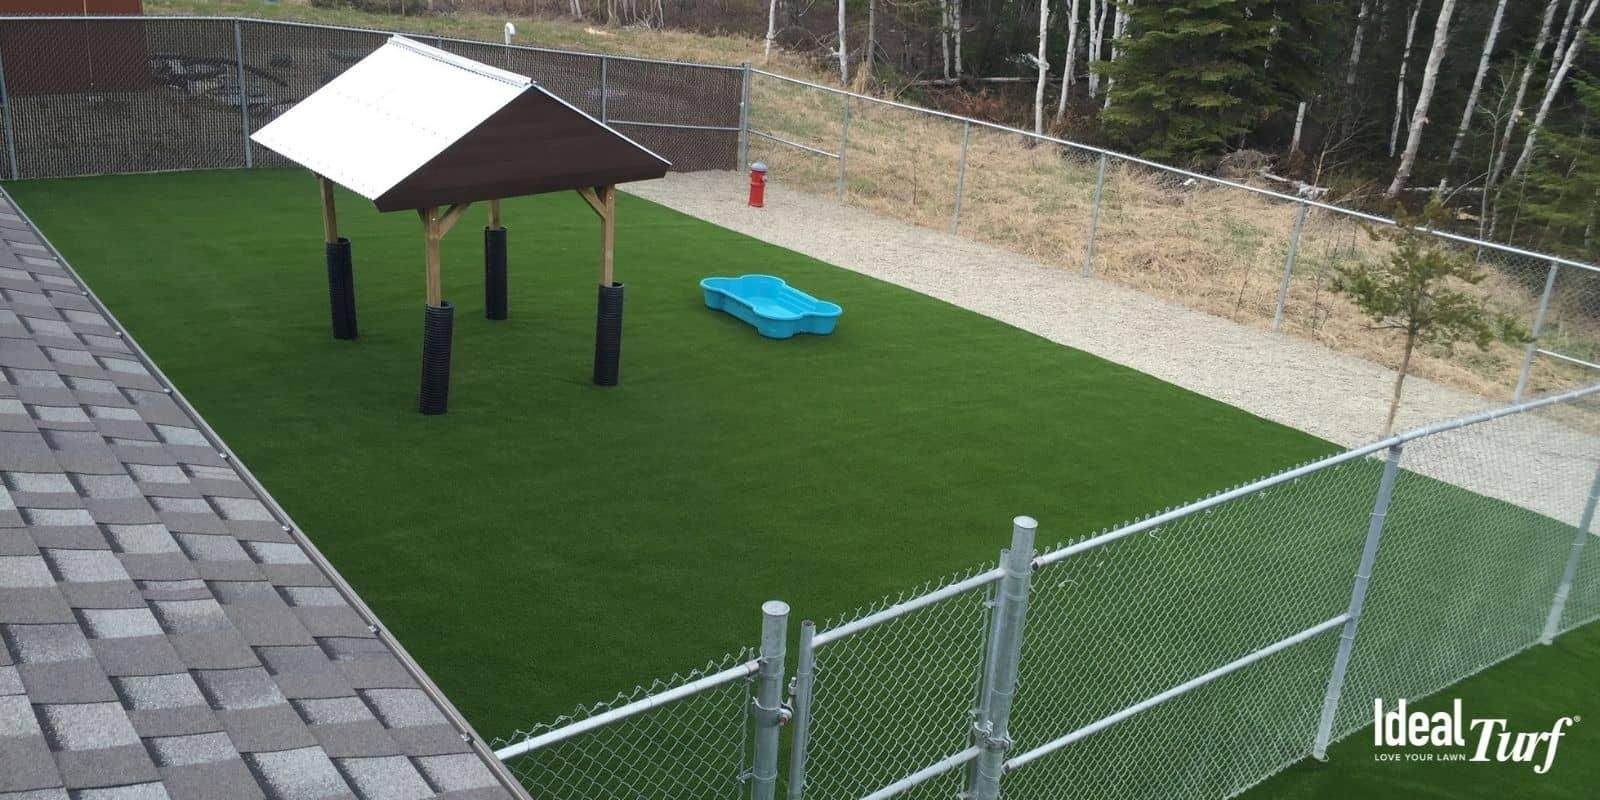 Artificial Turf Backyard Dog Run with chain-link fence